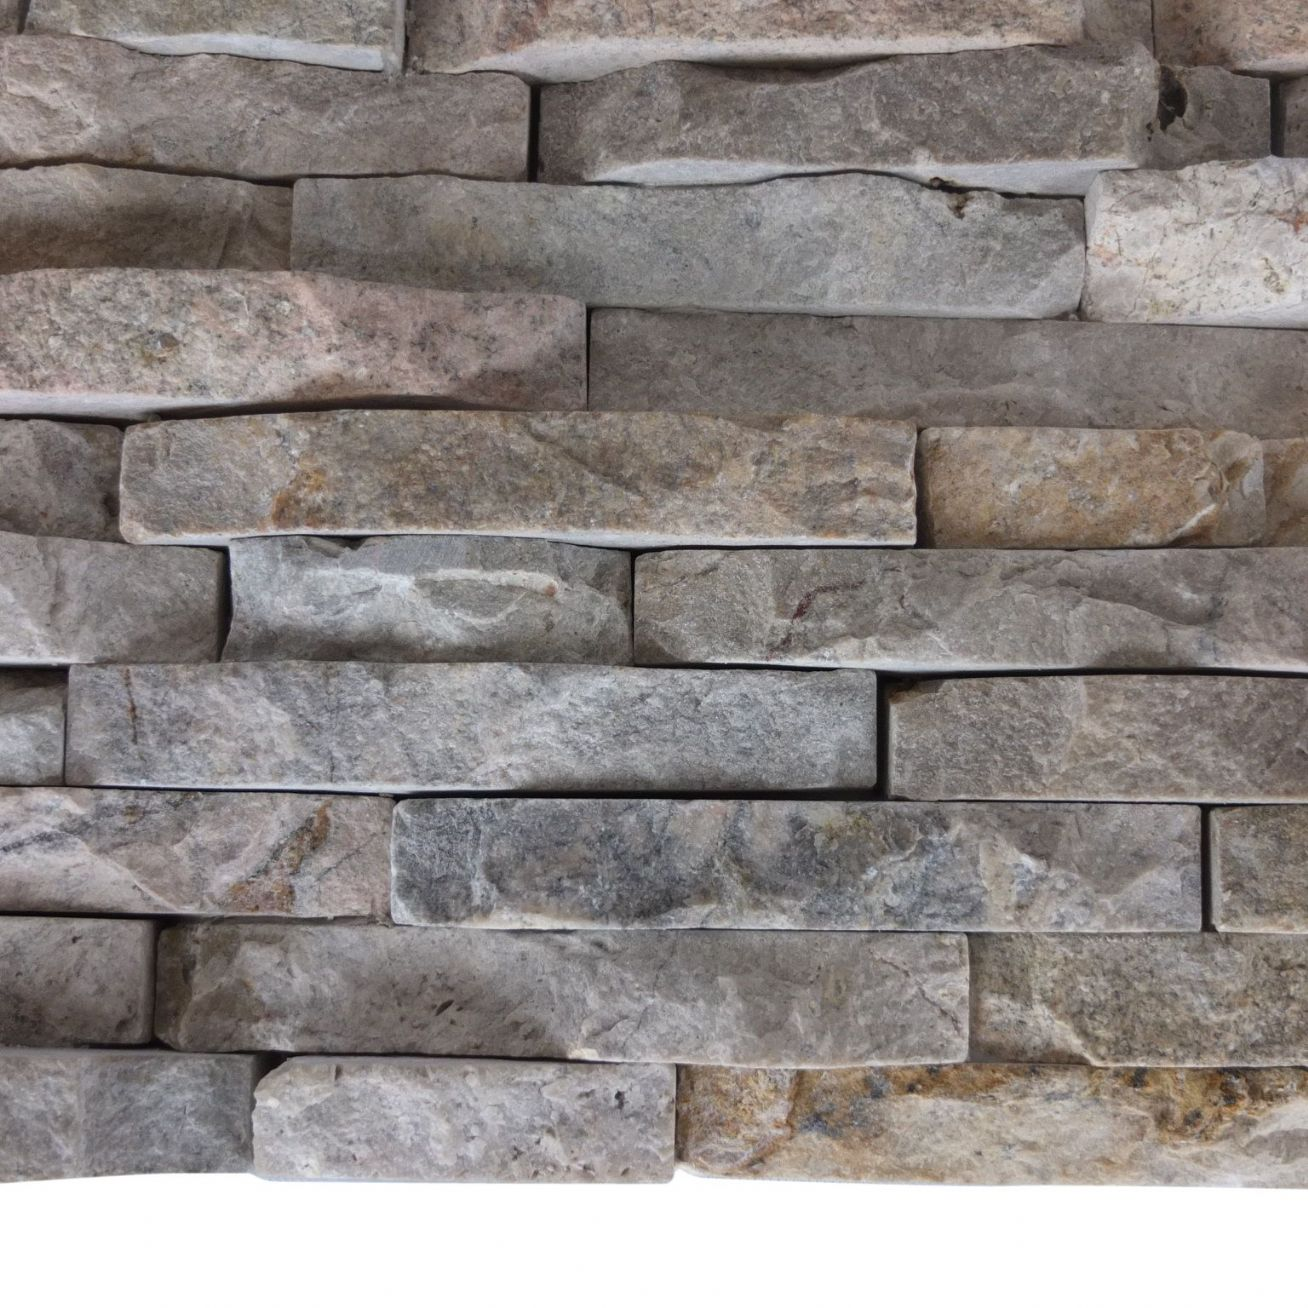 Kitchen Wall Tiles Design In Nigeria: Sample Split Face Mini Mosaic Tile Ledge Stone Beige